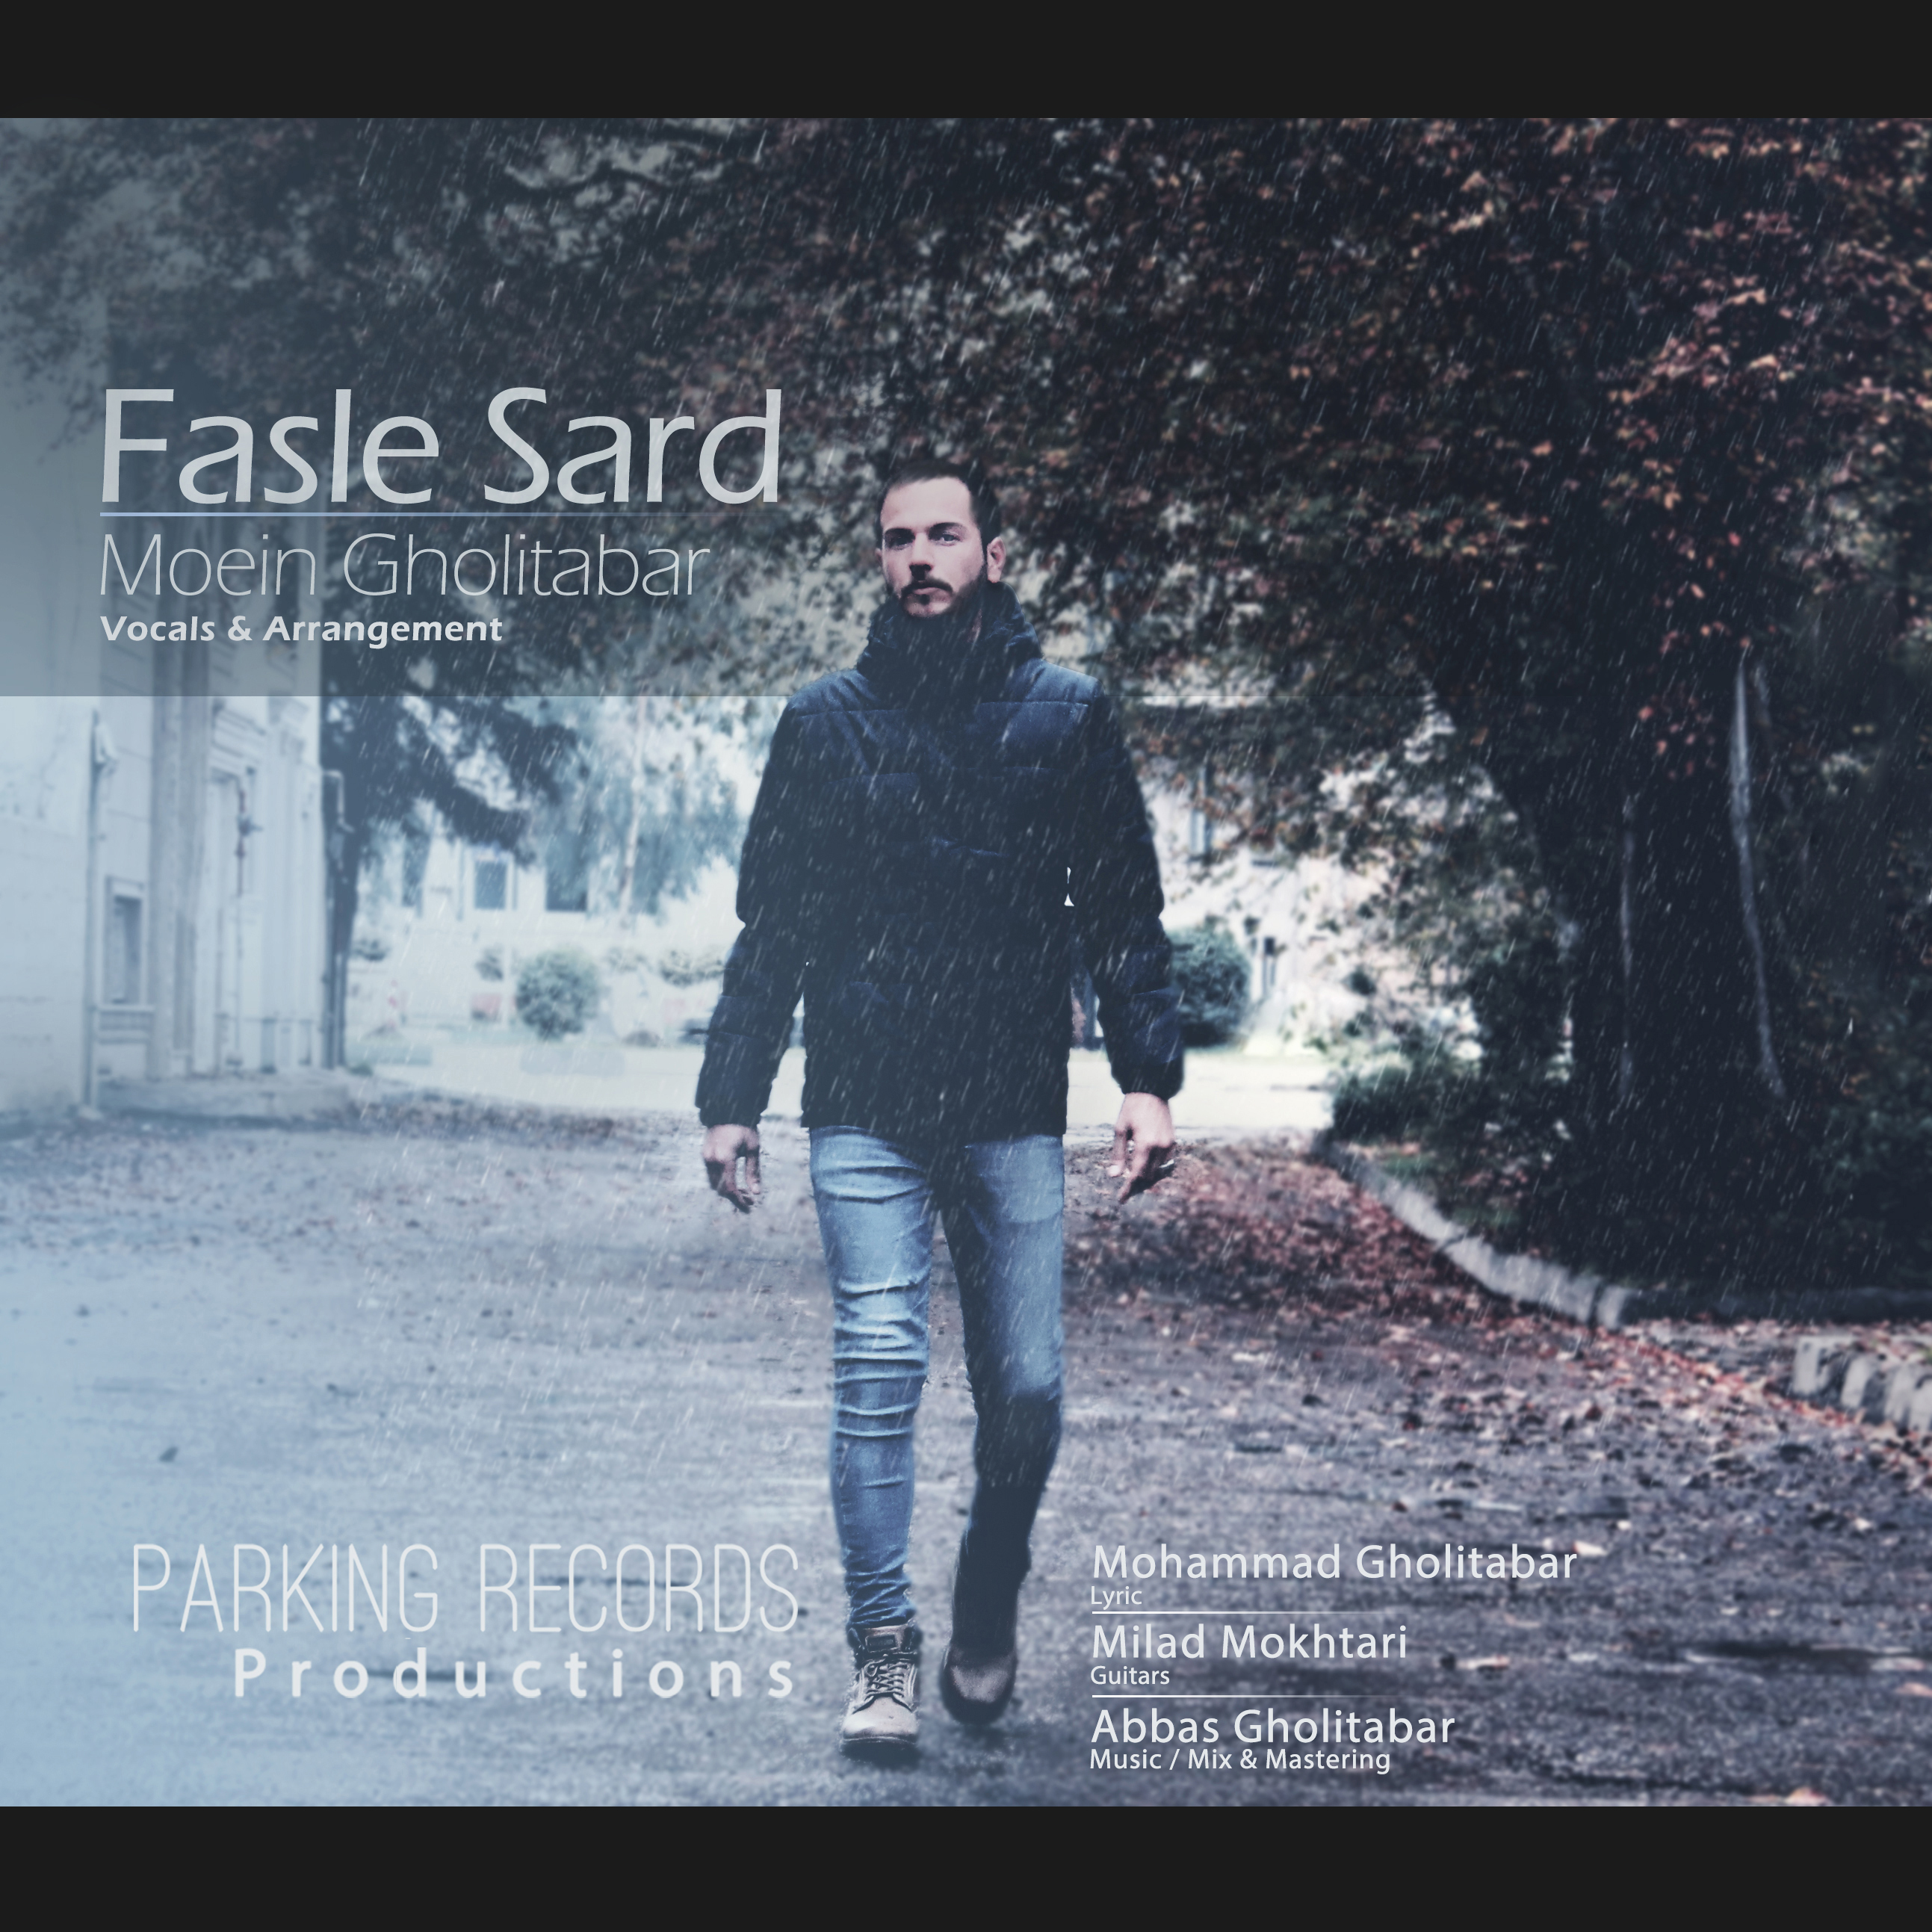 Moein Gholitabar – Fasle Sard